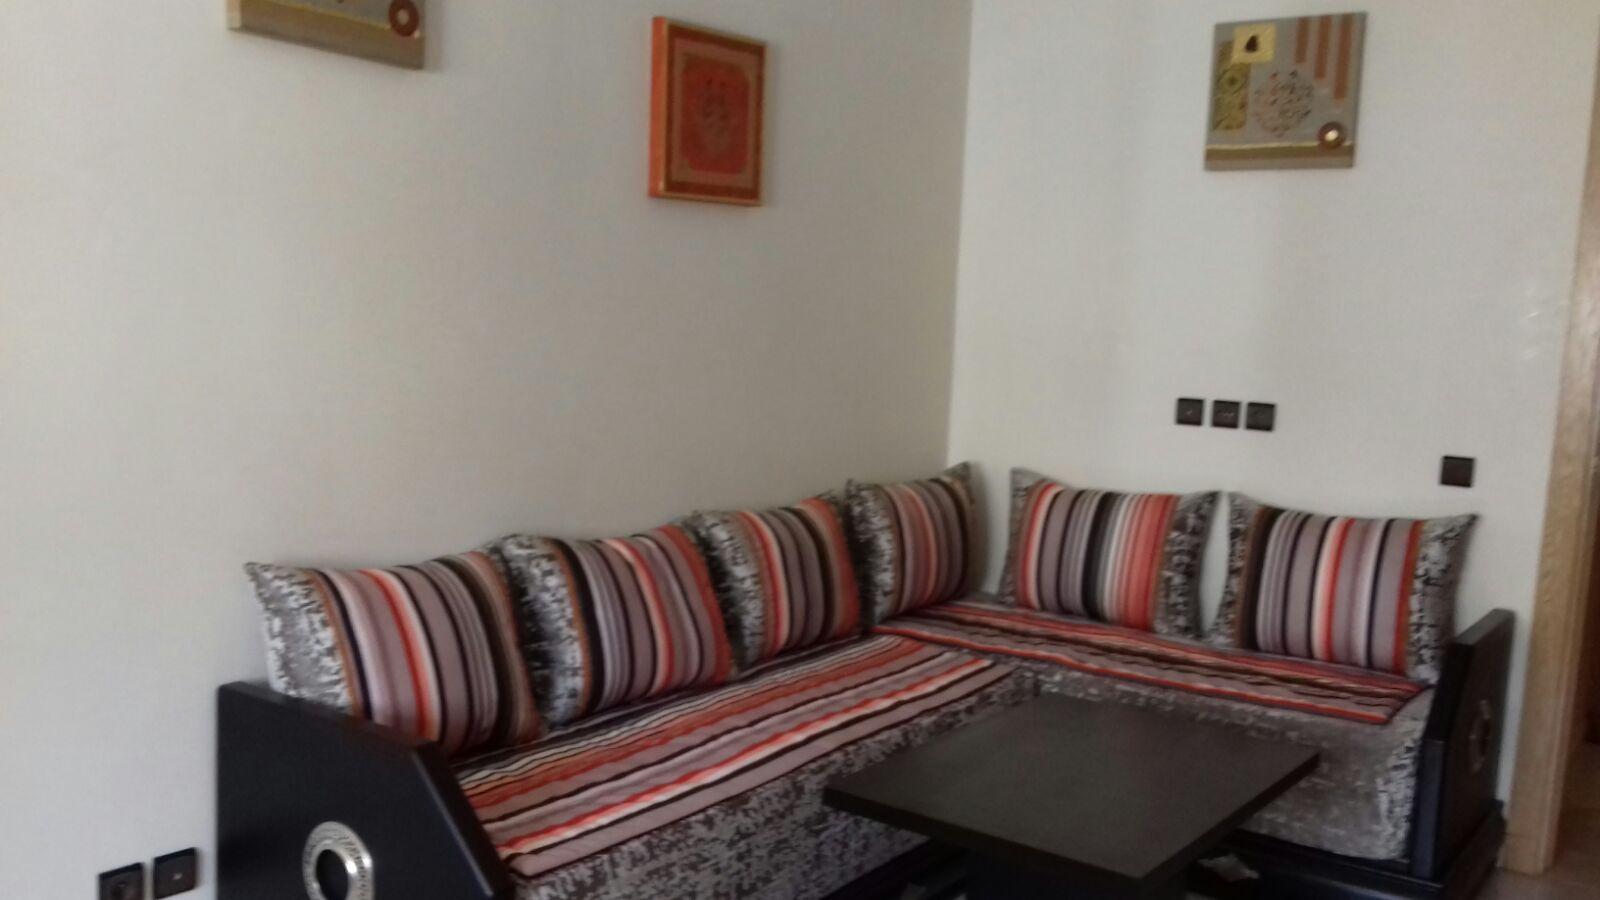 super studio meubl a louer a agdal rabat partir de 70eur 35m properties cost. Black Bedroom Furniture Sets. Home Design Ideas